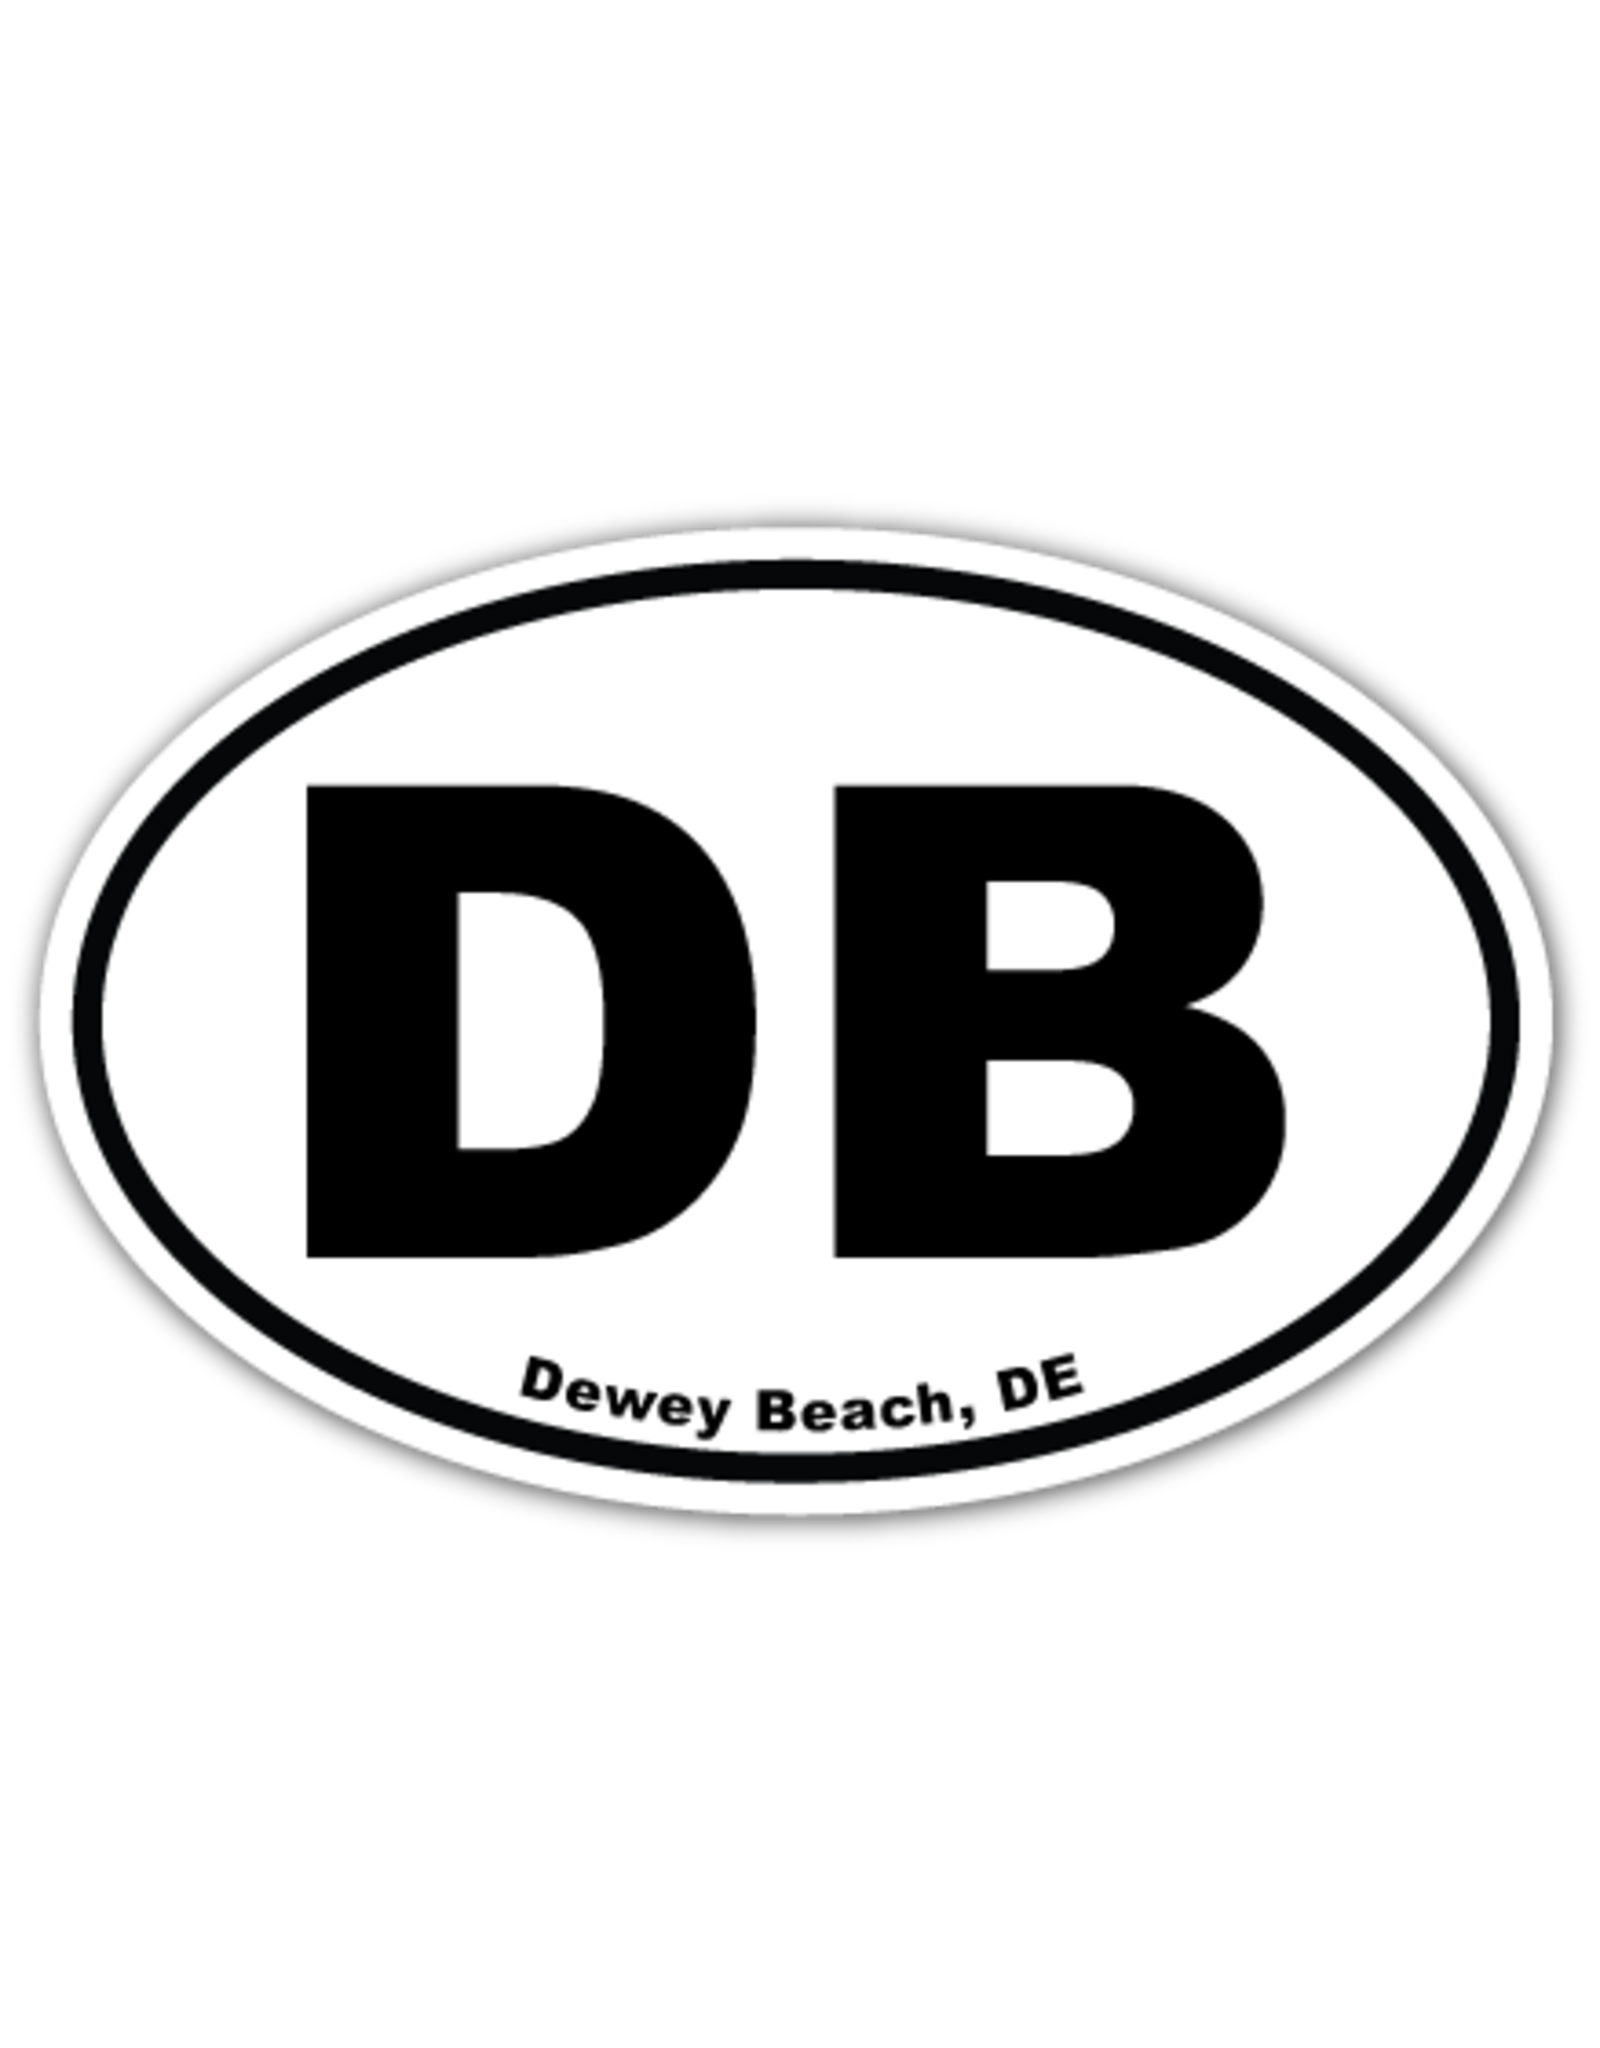 REHOBOTH LIFESTYLE EURO MAGNET 5.75 x 3.875 OVAL DEWEY BEACH